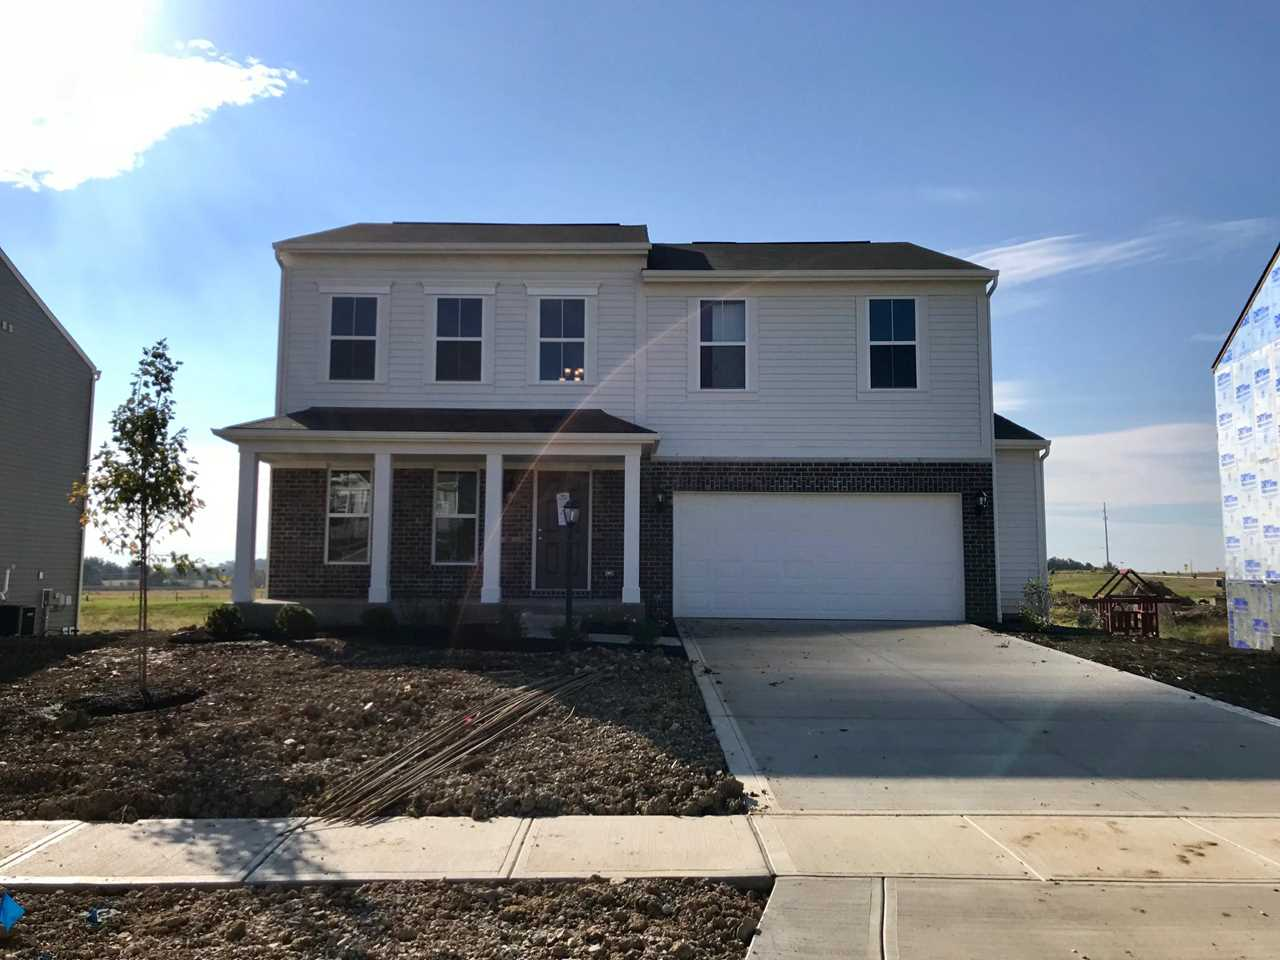 1522 Cowan Creek Drive Marysville, OH 43040 | MLS 218011699 Photo 1